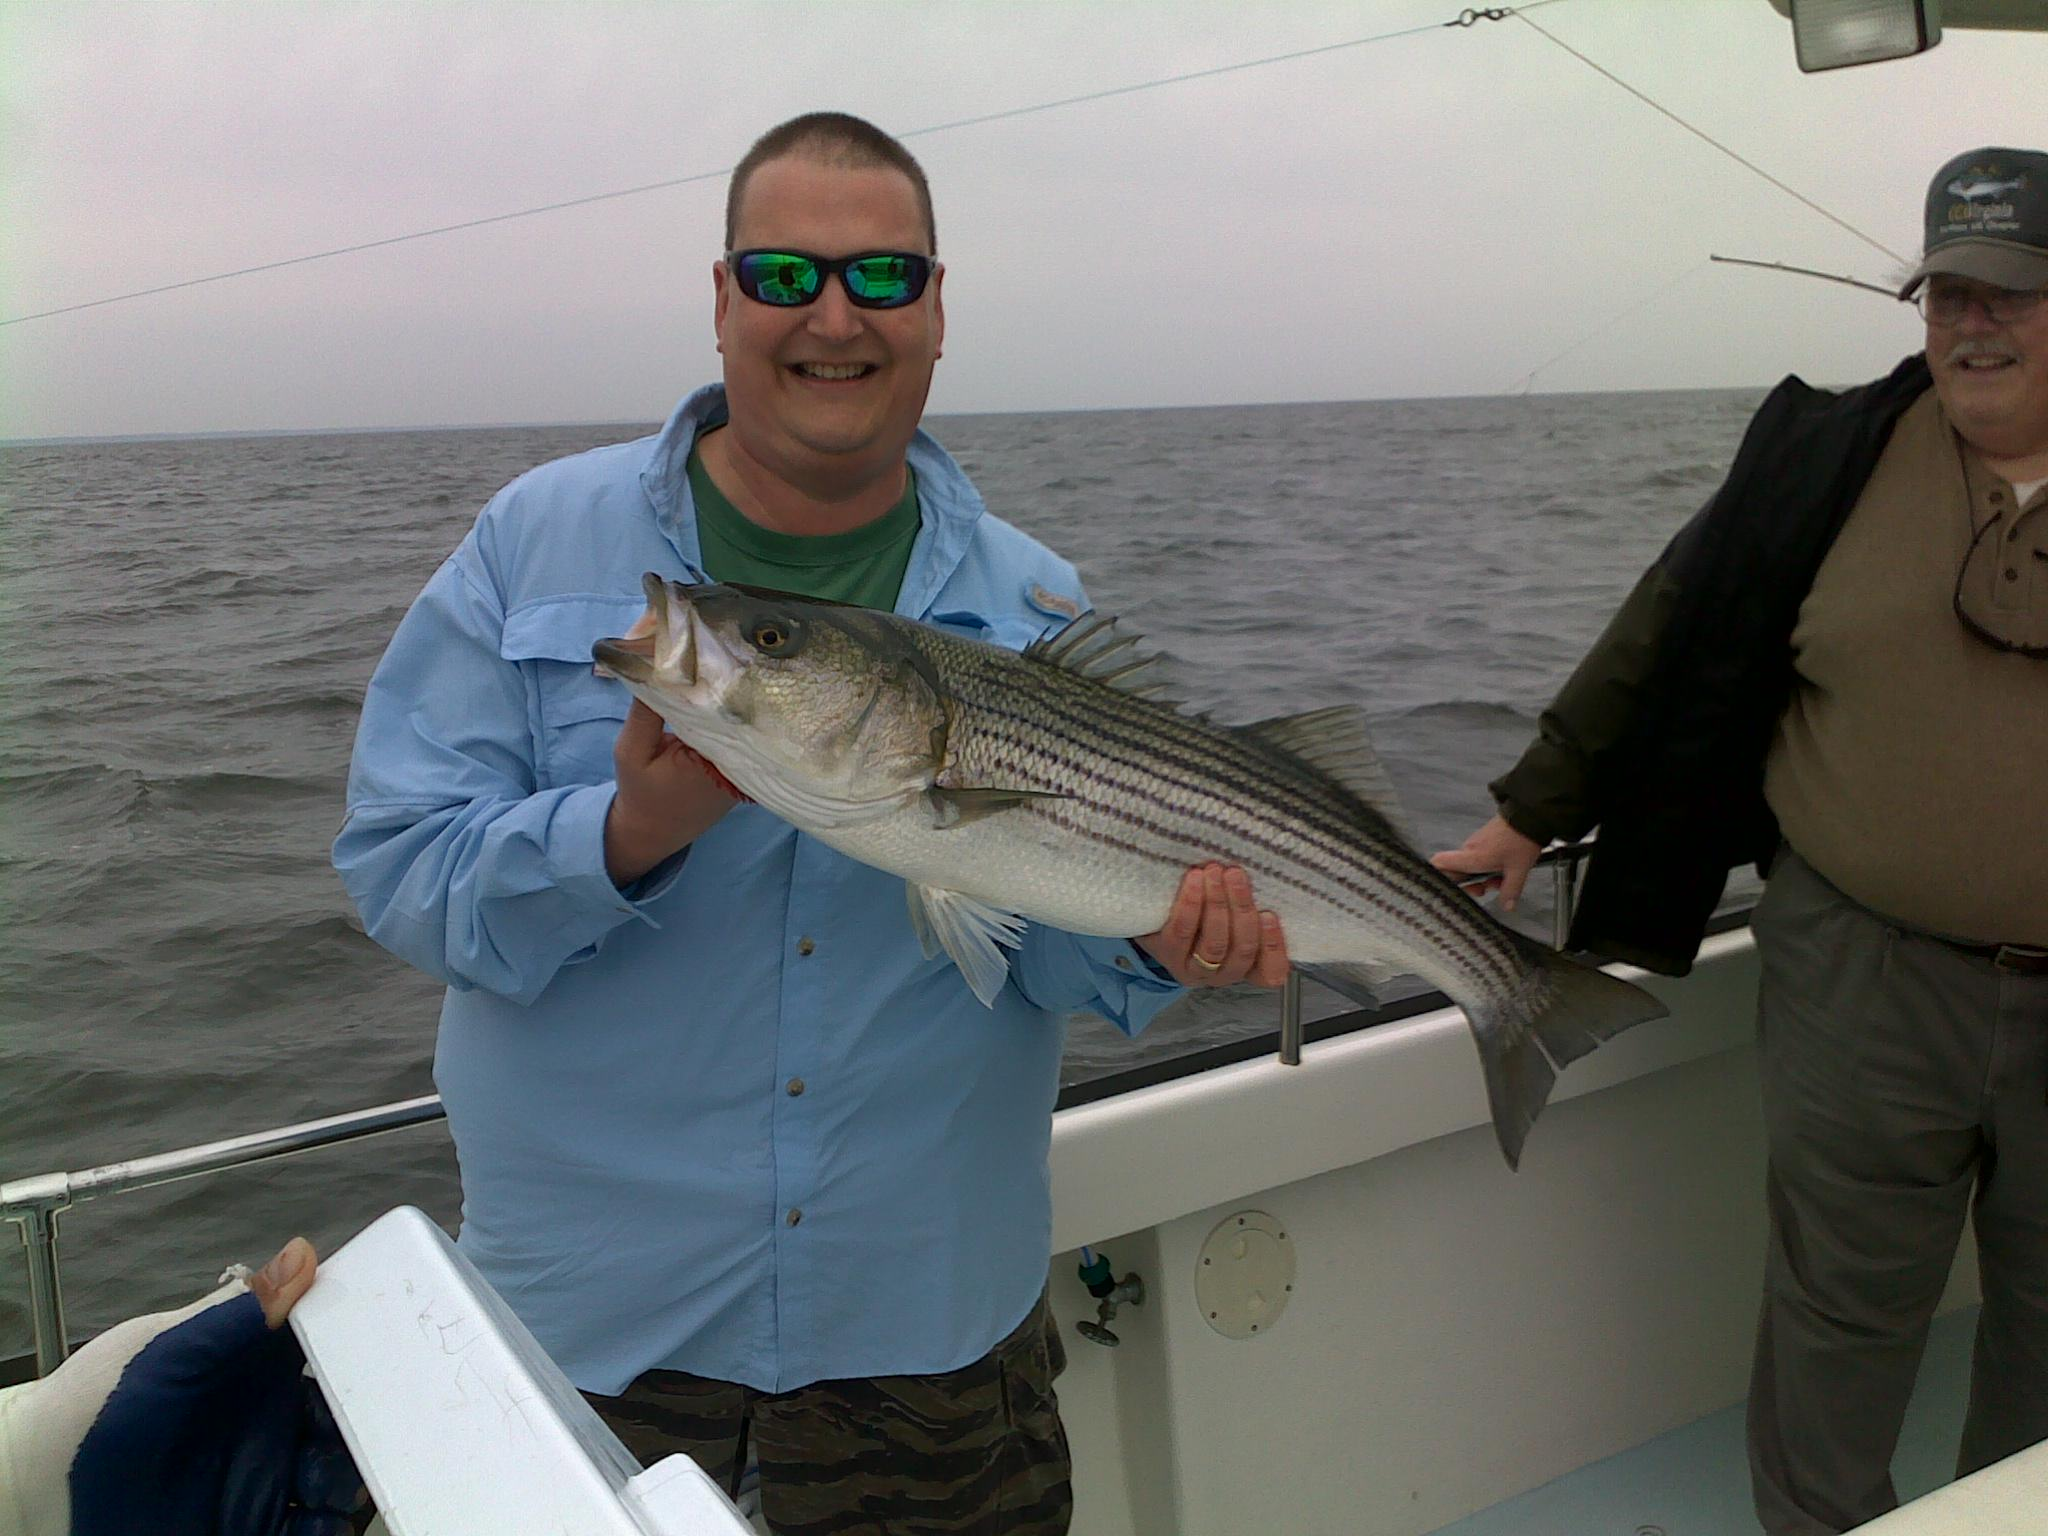 Striper fishing trip chesapeake bay guysnation for Chesapeake bay striper fishing